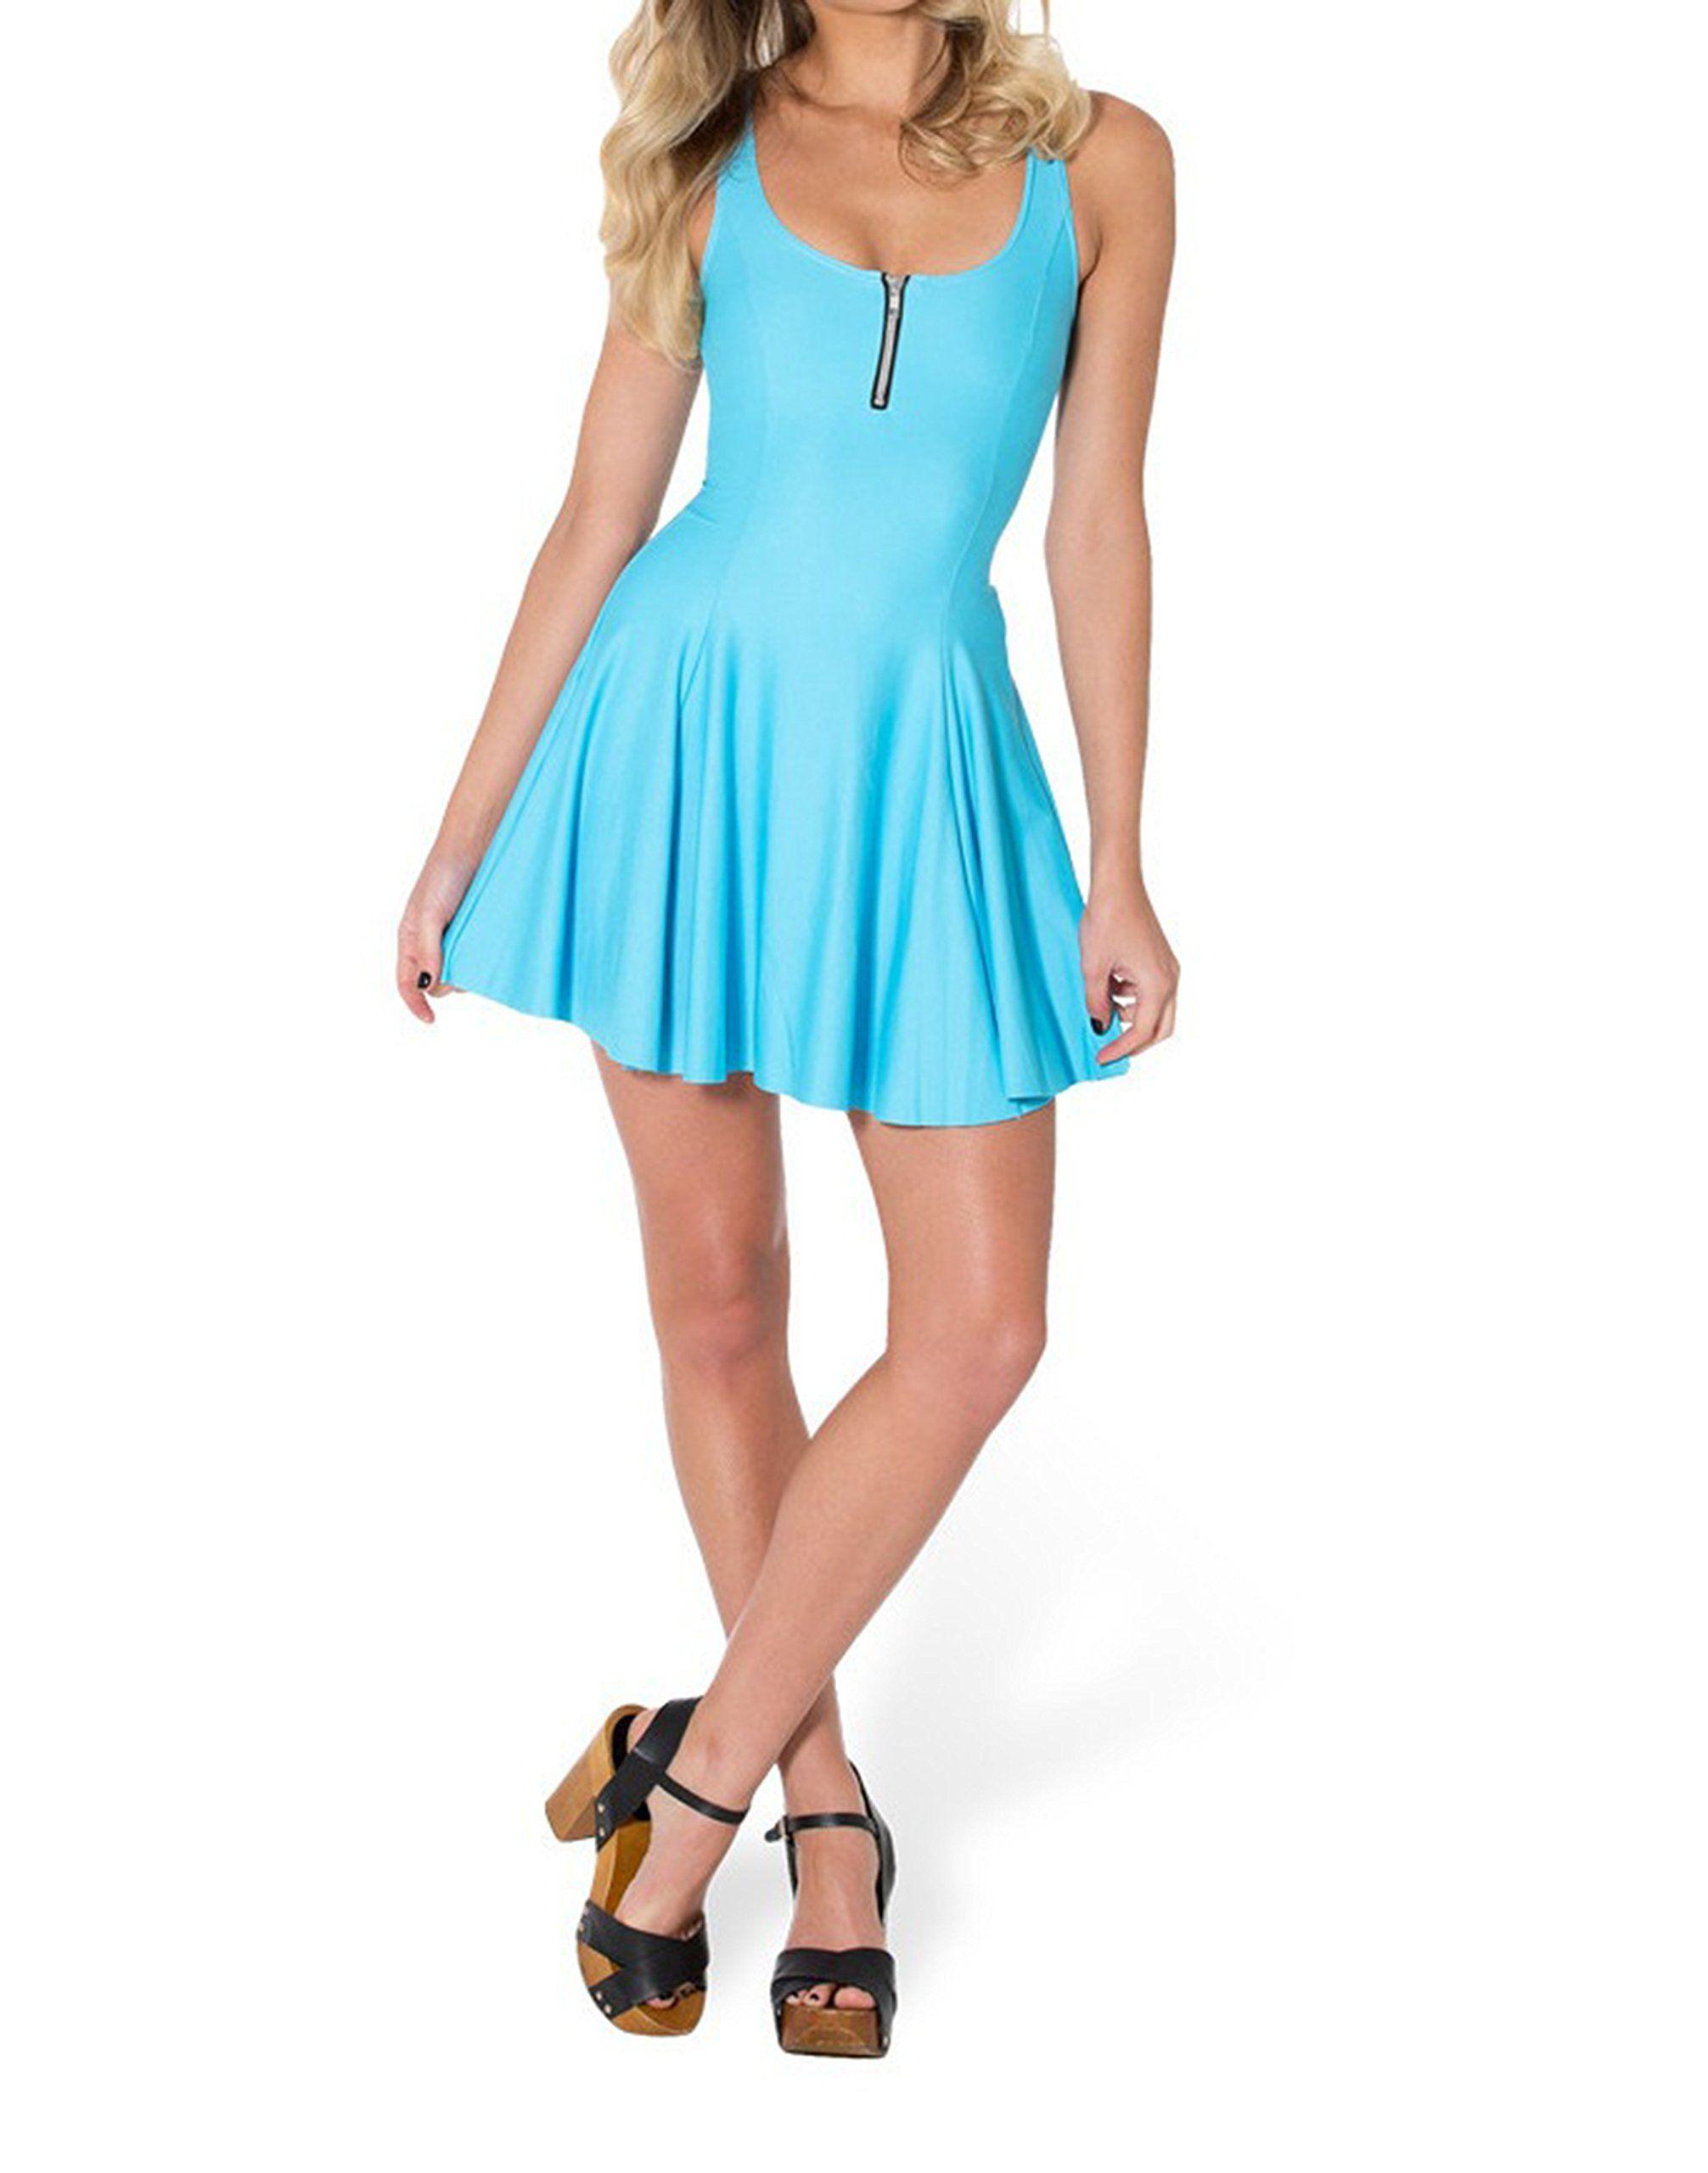 SOTW Summer Pleated Above-Knee Sexy Spandex Sleeveless Mini Evil Zip Skater Dress, Matte Light Blue, S